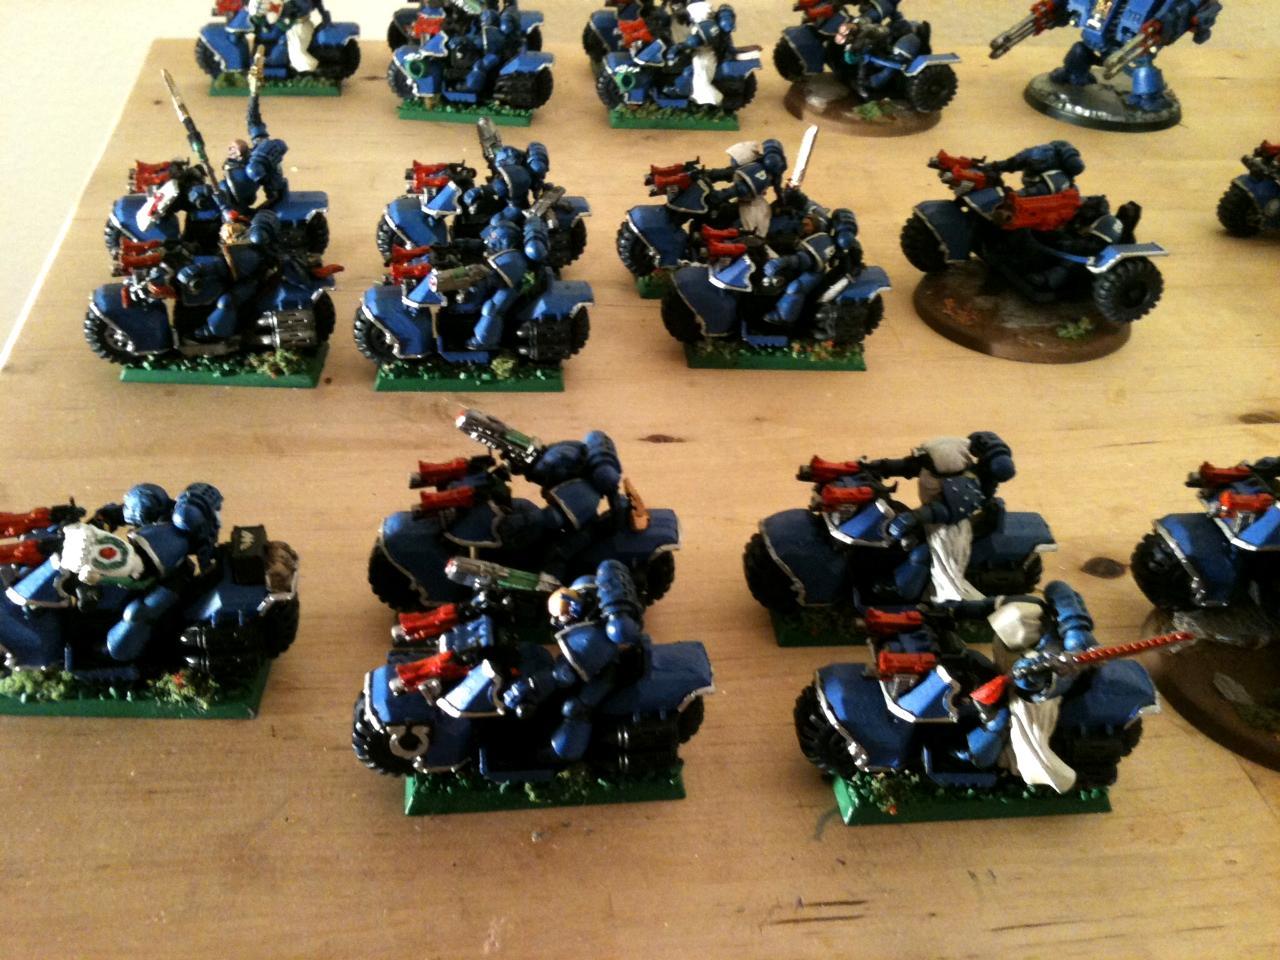 Bike Troops, Bike Troops